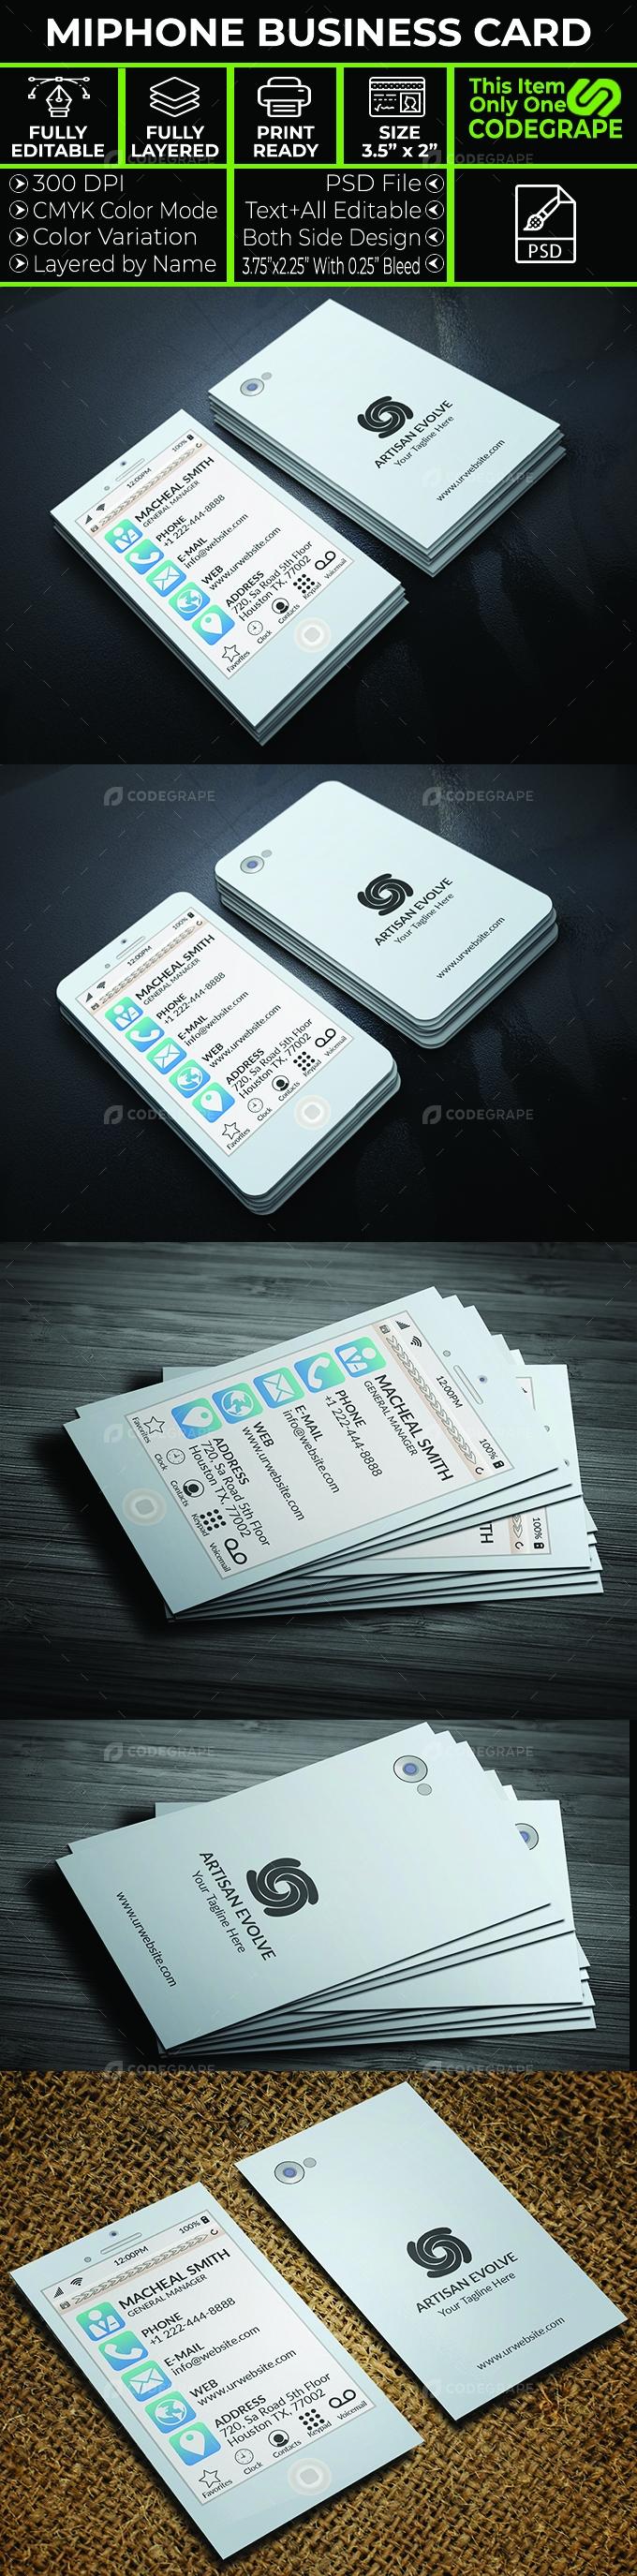 Miphone Business Card Design Template